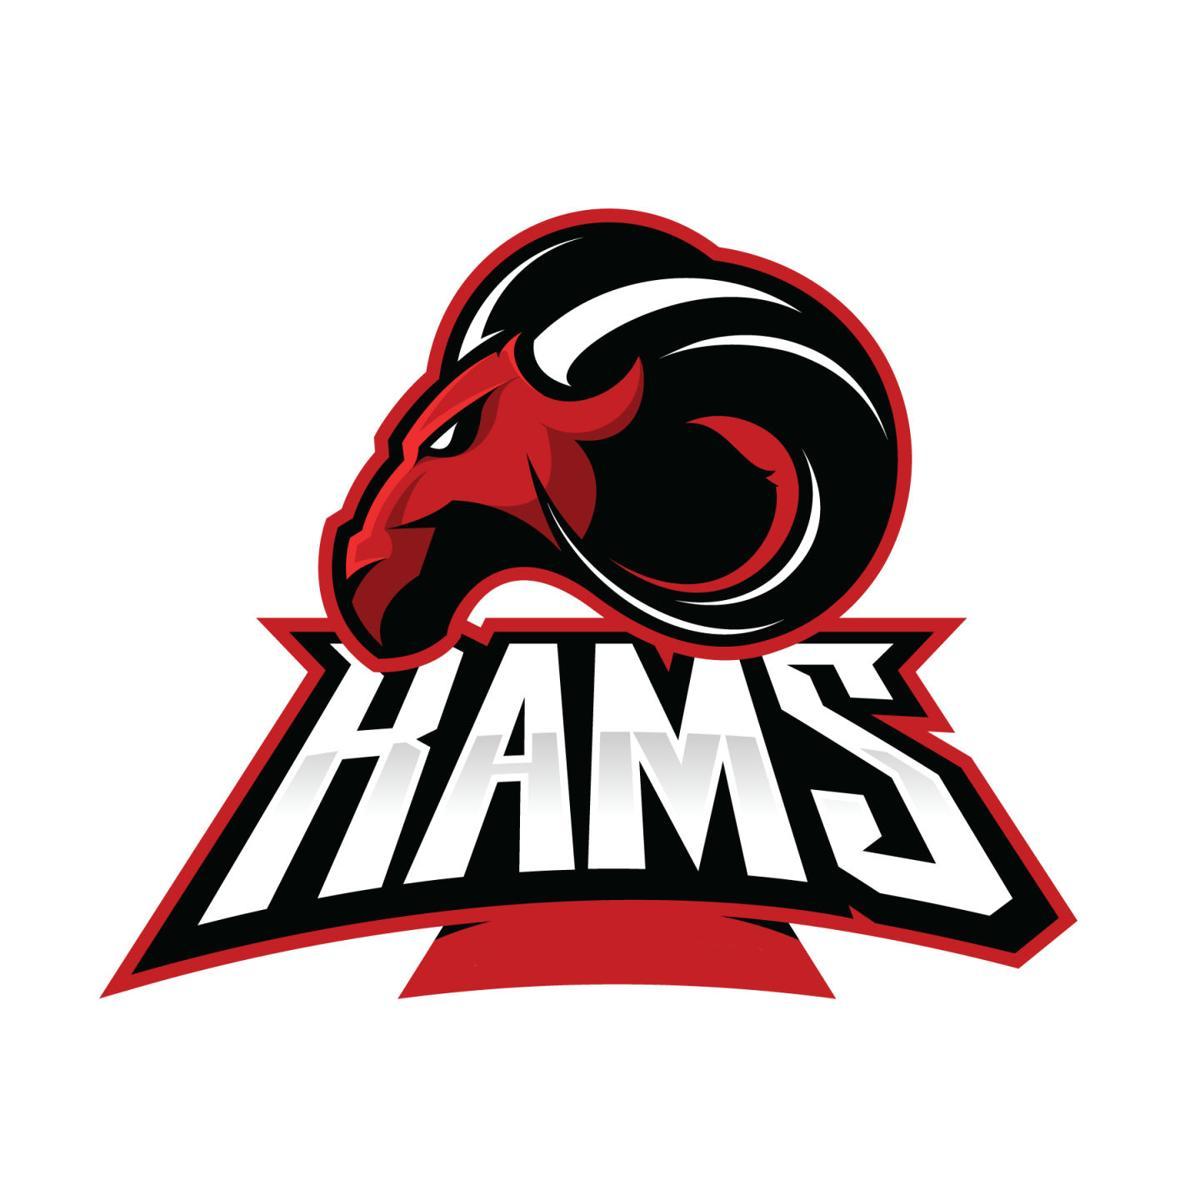 CVHS Ram logo